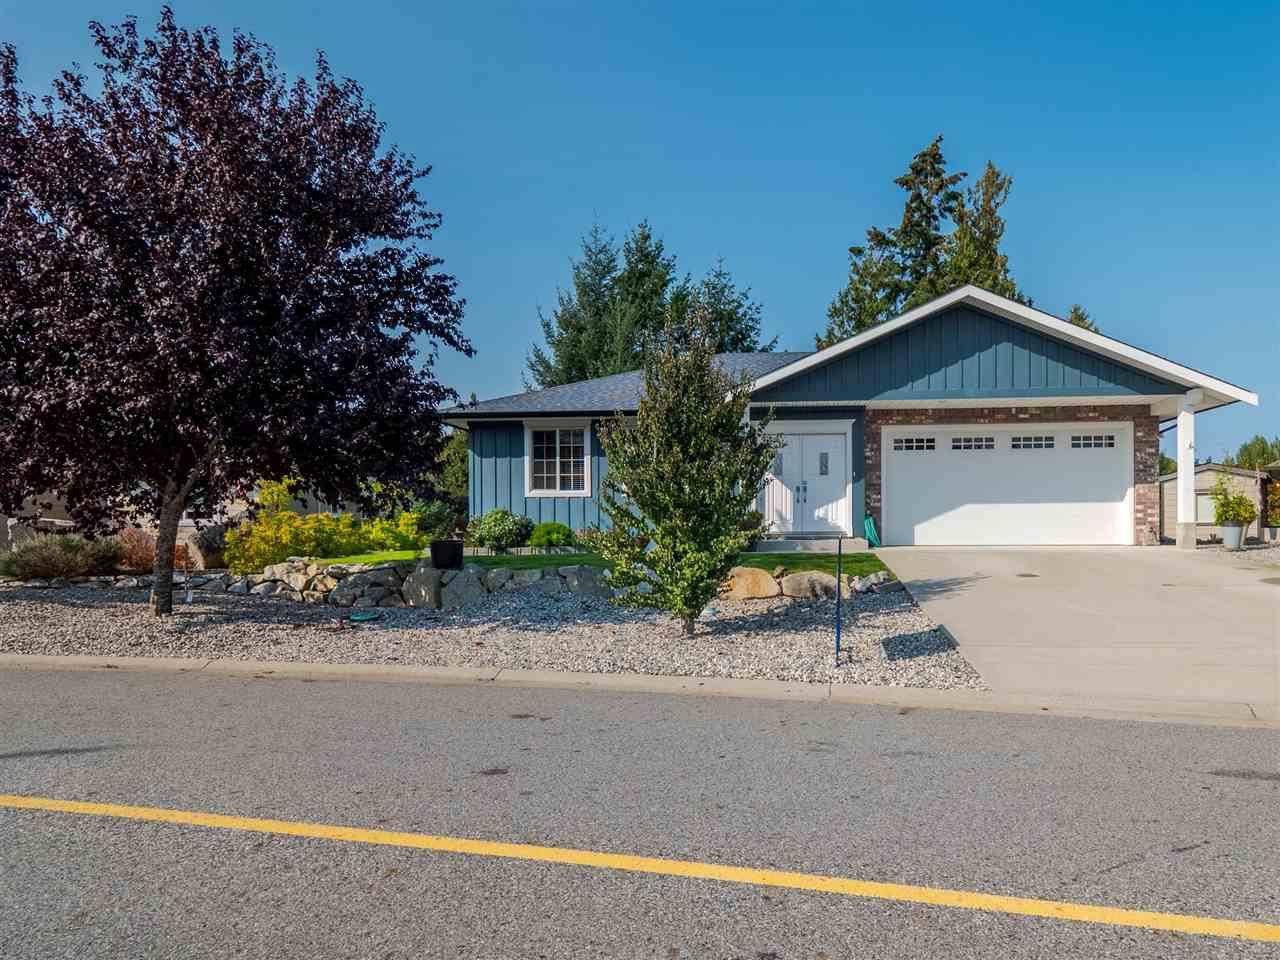 Main Photo: 5763 TURNSTONE Drive in Sechelt: Sechelt District House for sale (Sunshine Coast)  : MLS®# R2503935